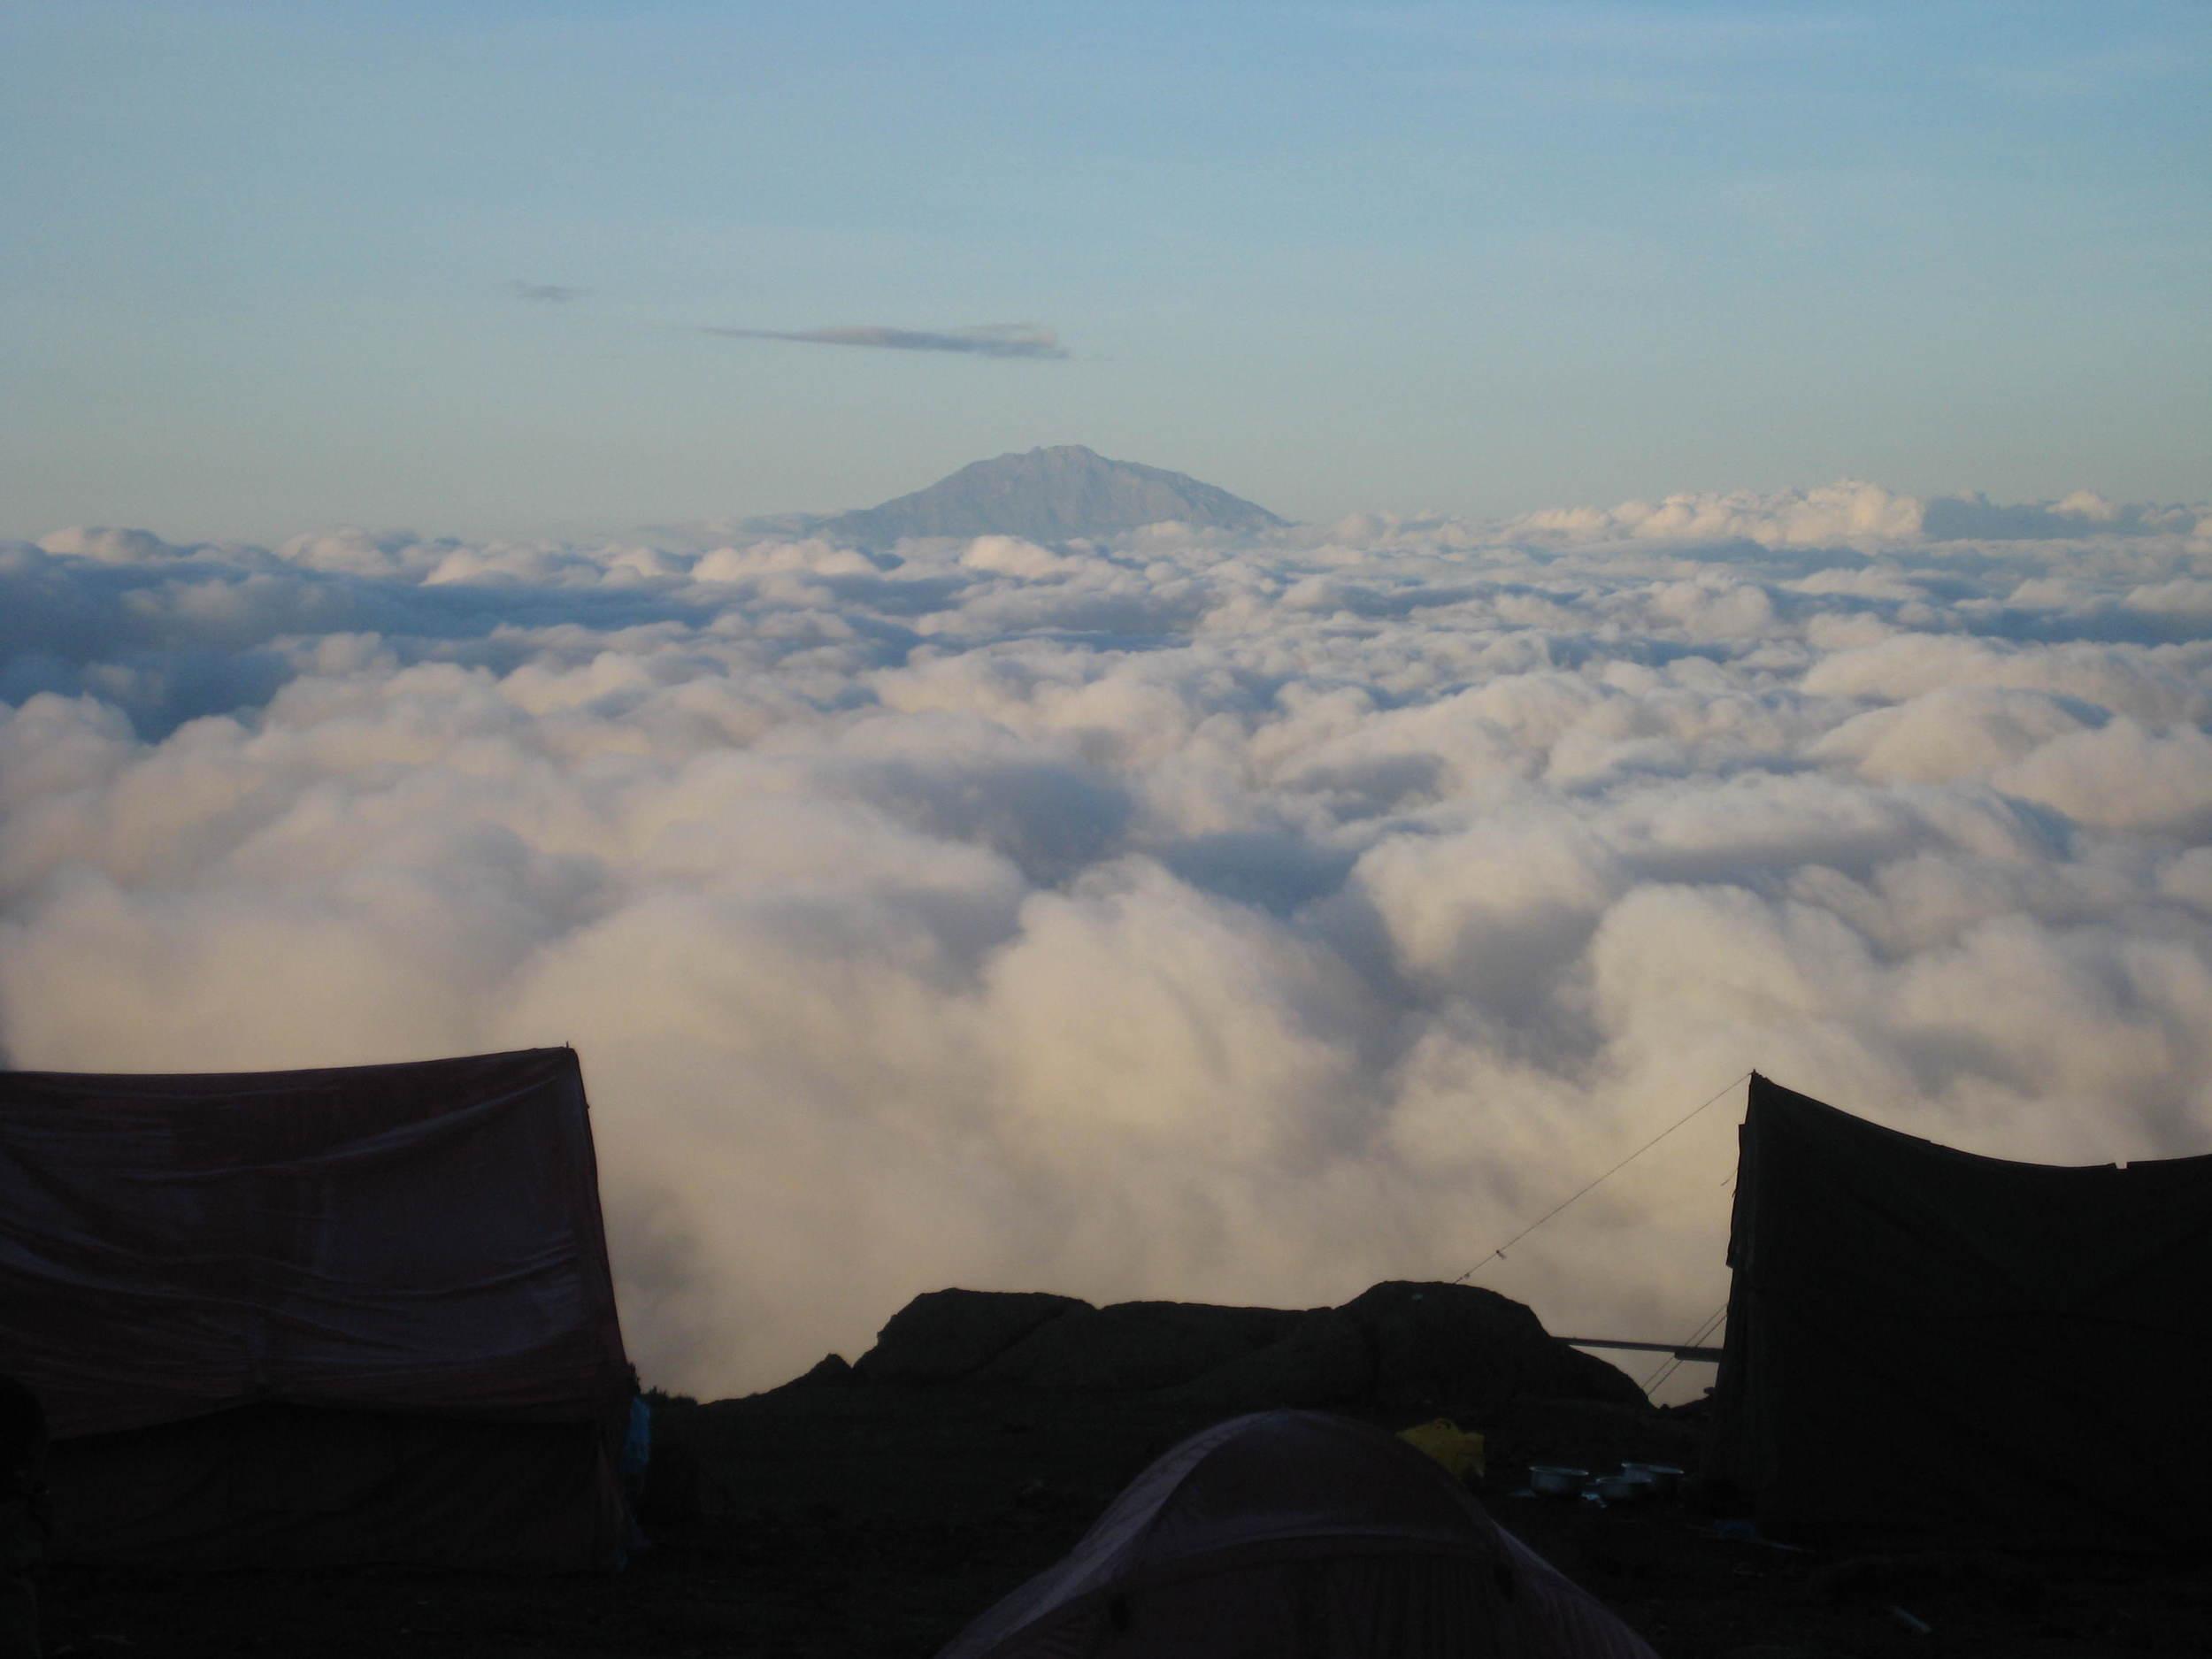 Tanzania, Mt. Kilimanjaro, 2011